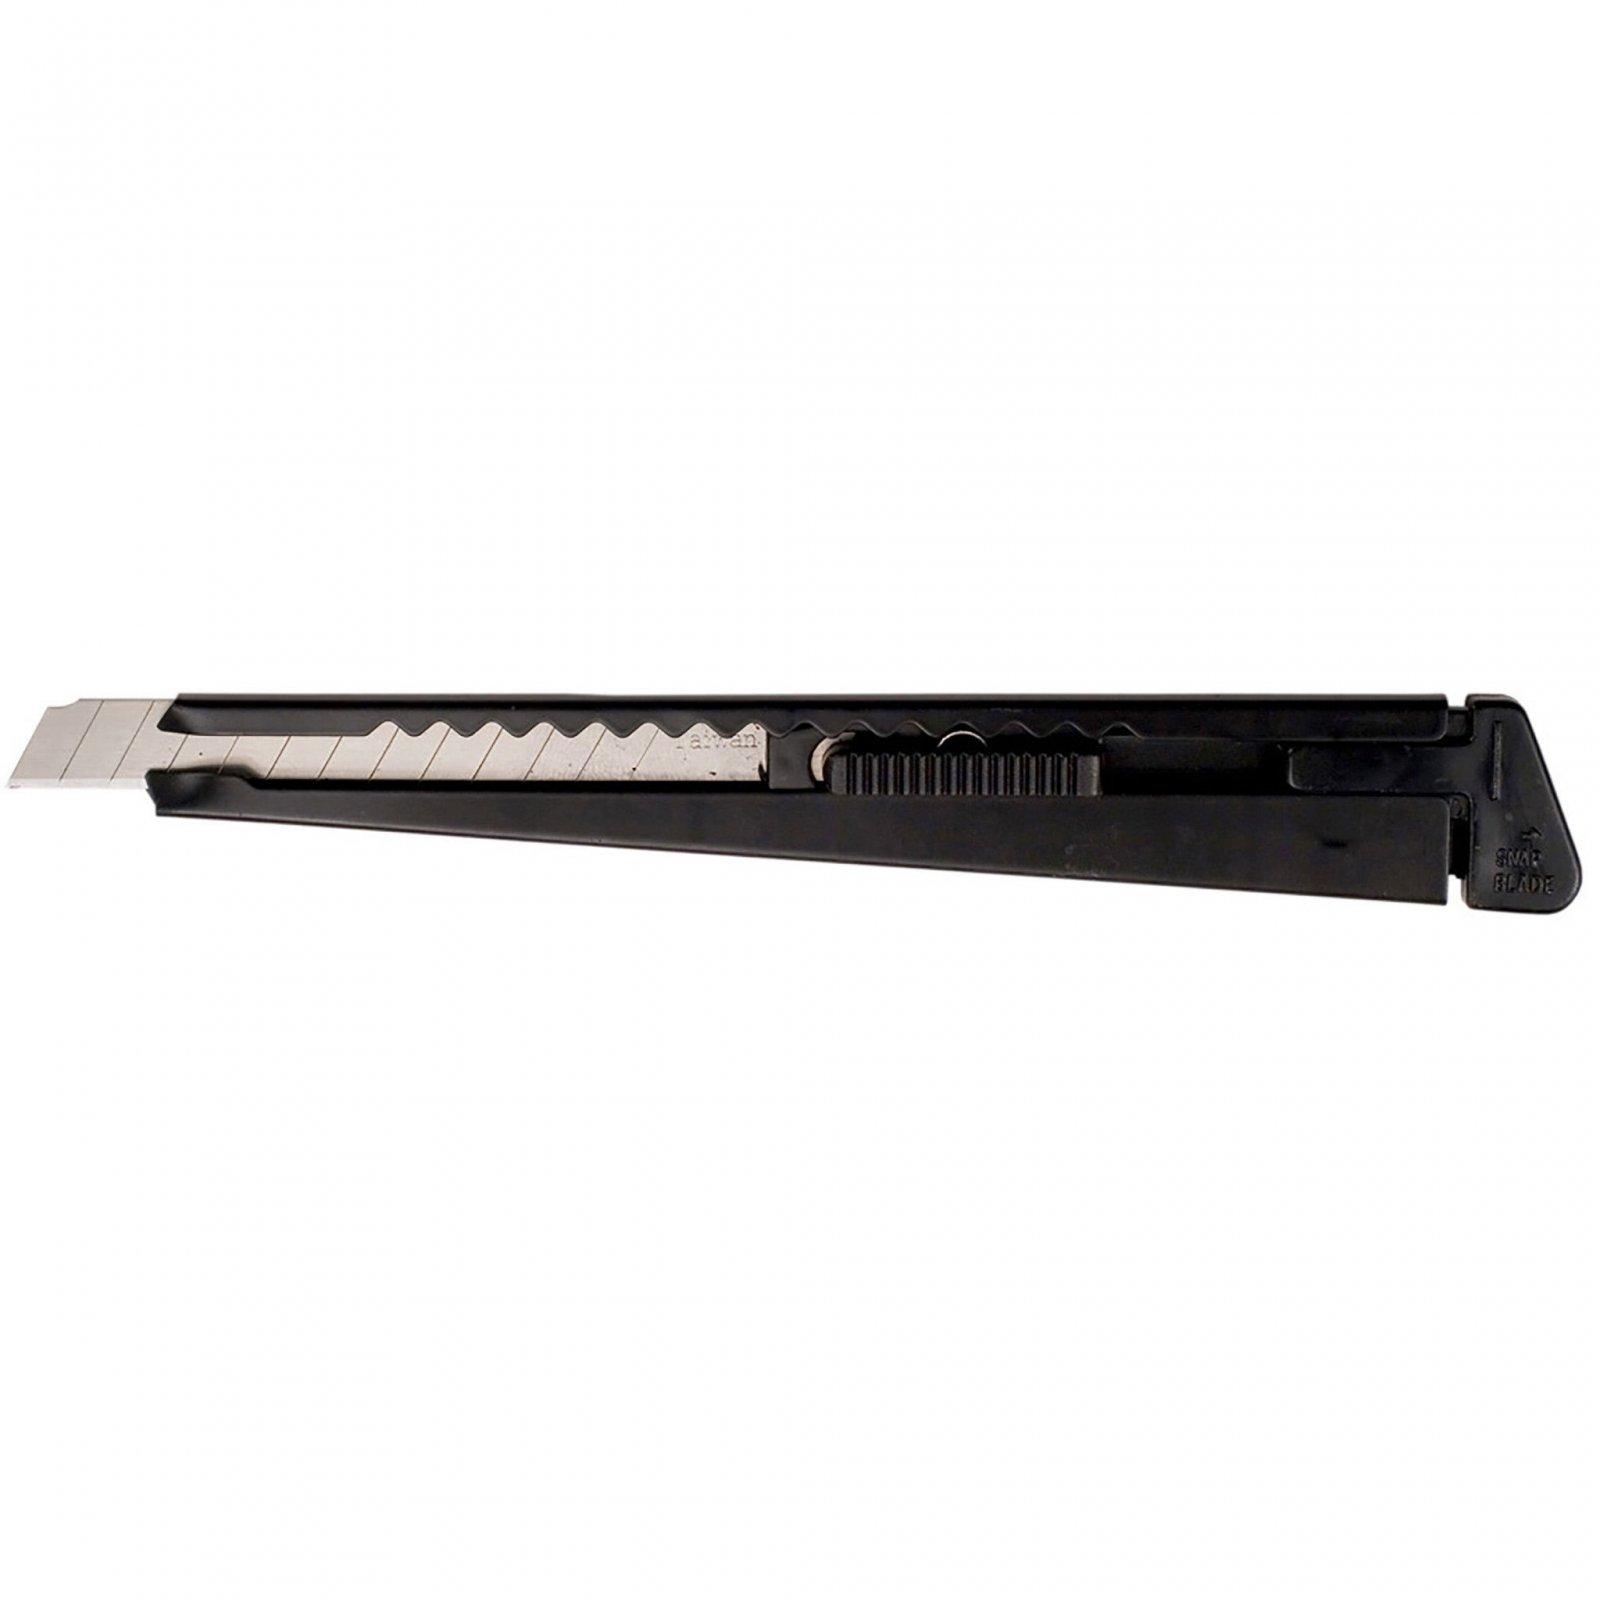 Excel K14 9MM Plastic Body Snap Blade Knife